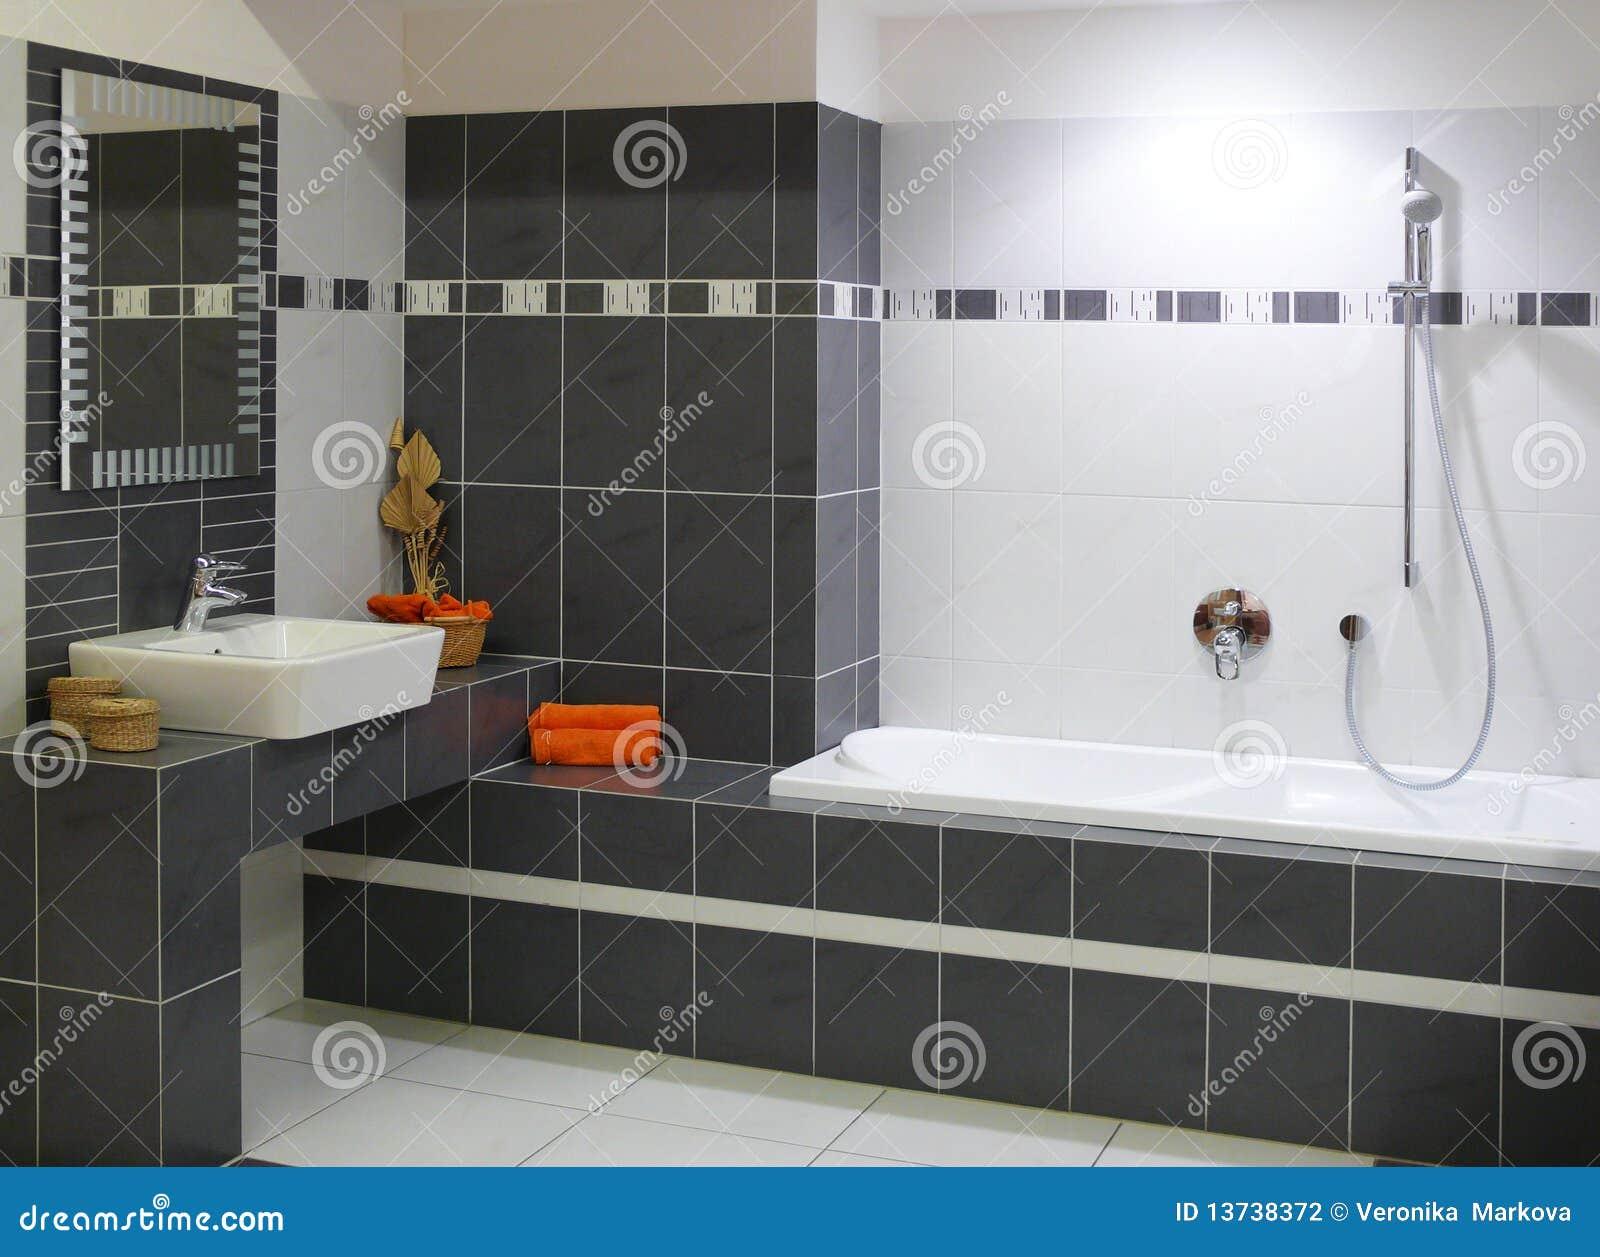 Idee deco salle de bain moderne - Idee carrelage salle de bain moderne 2 ...